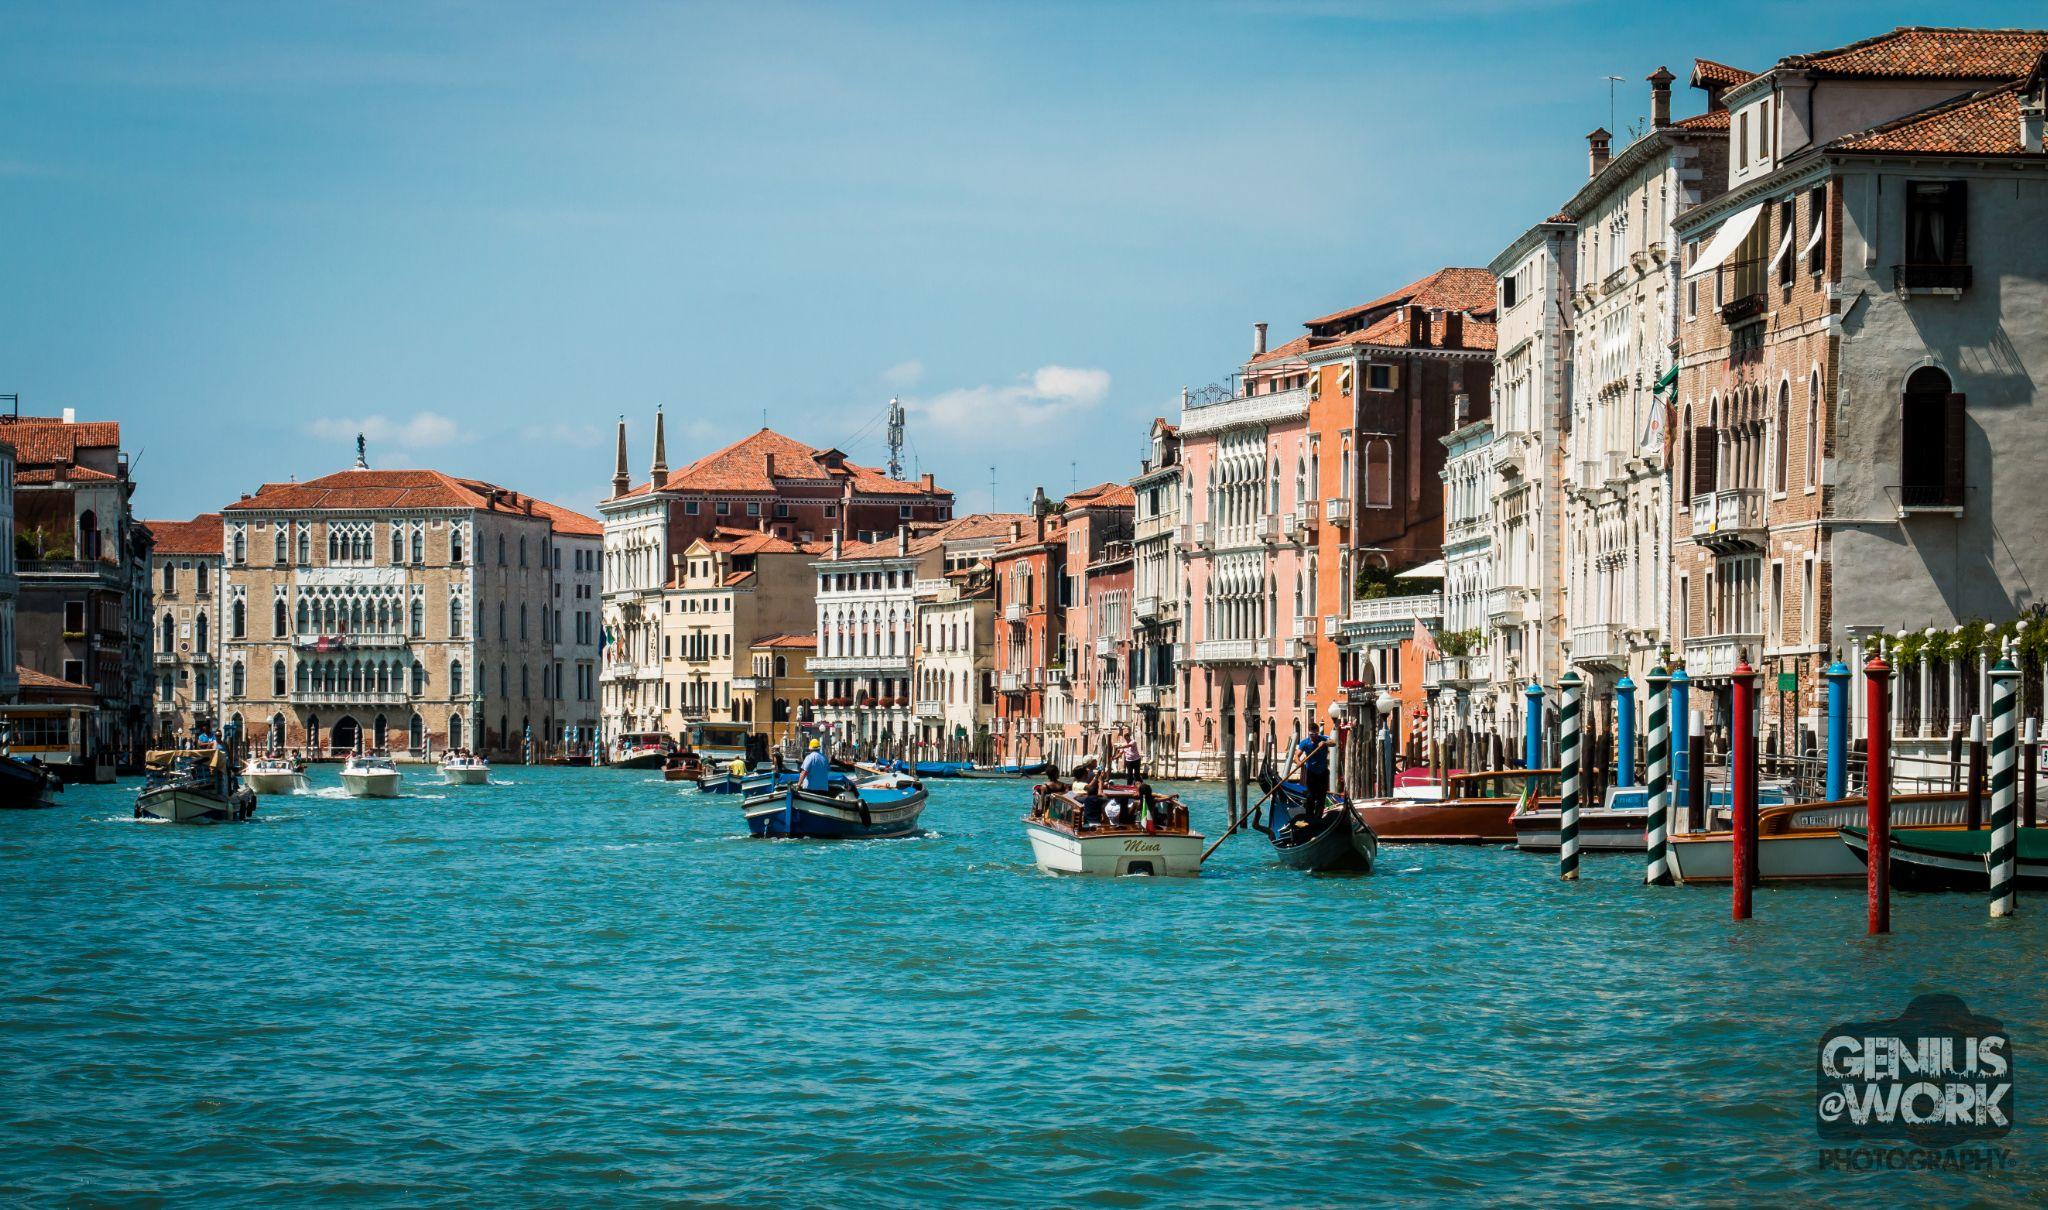 City on Water by Jason Saint-Elie